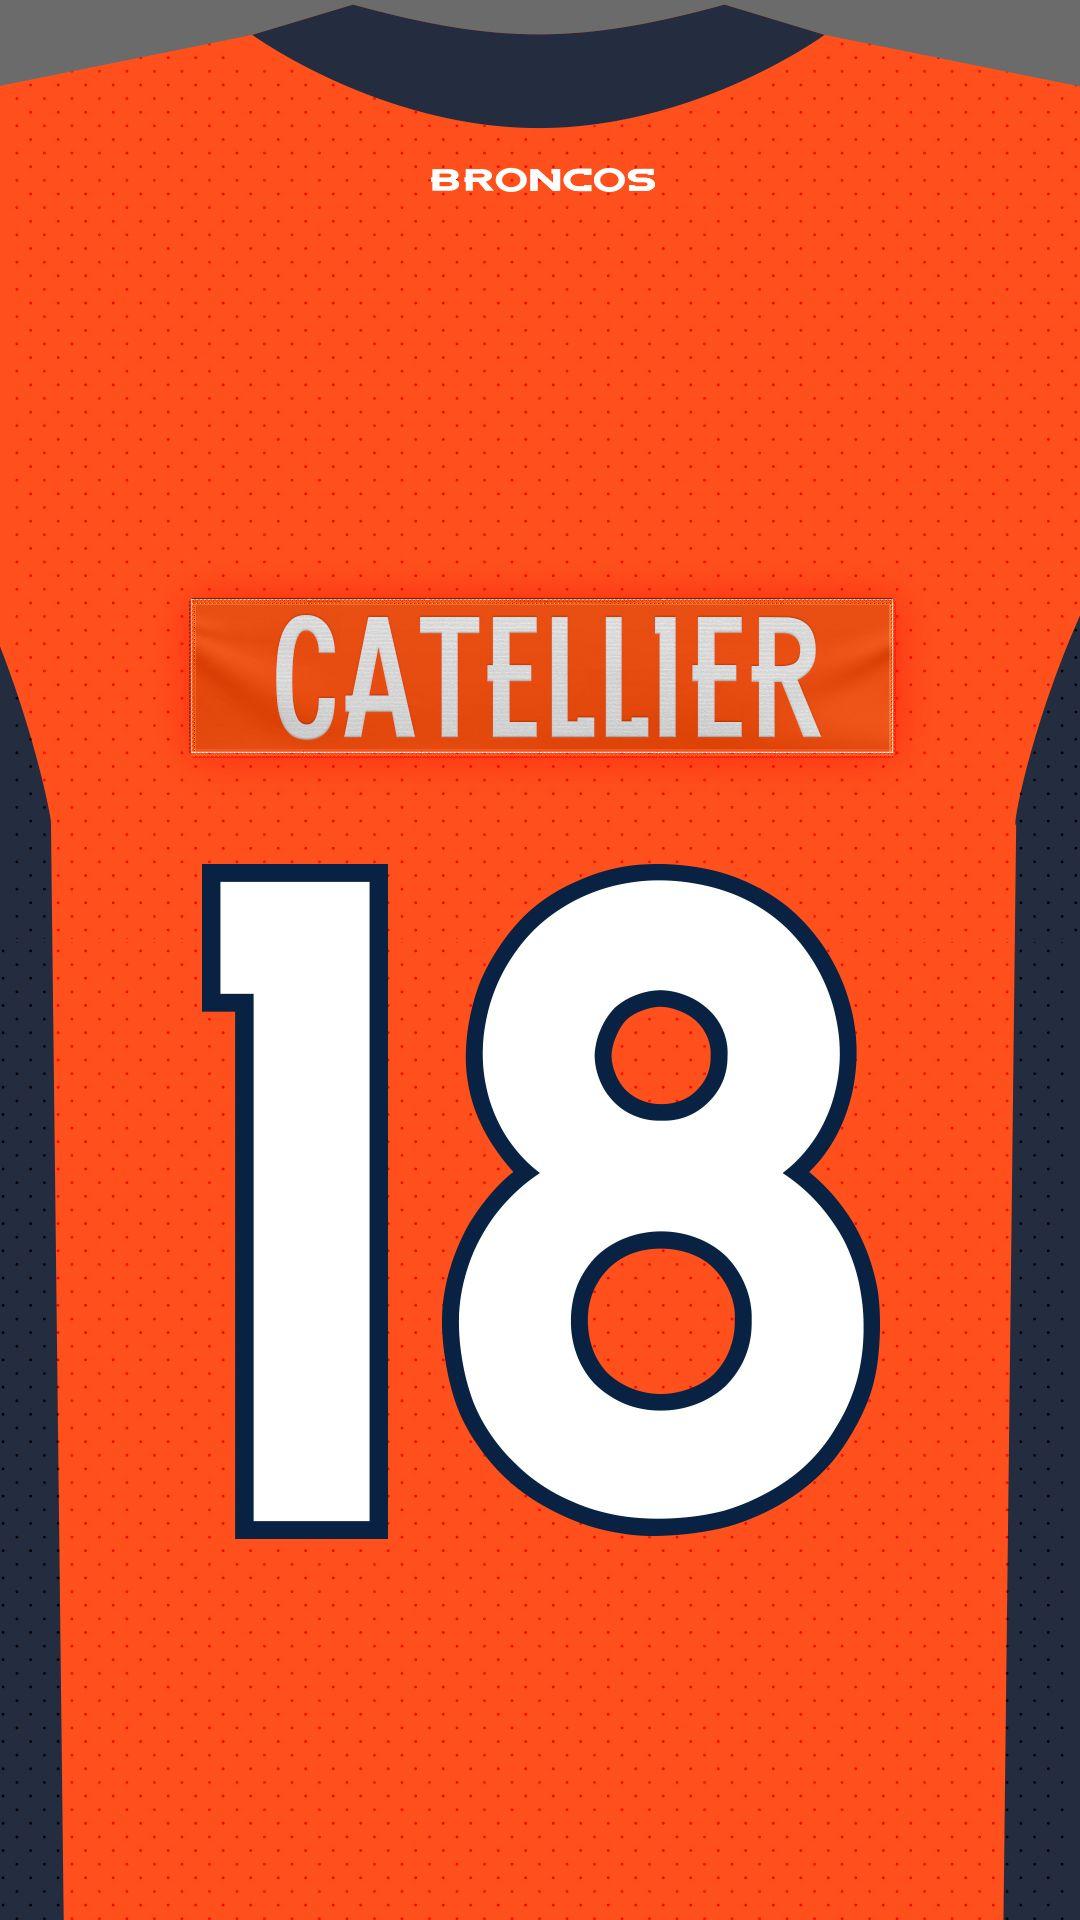 Denver Broncos on Broncos, Denver broncos, Lululemon logo